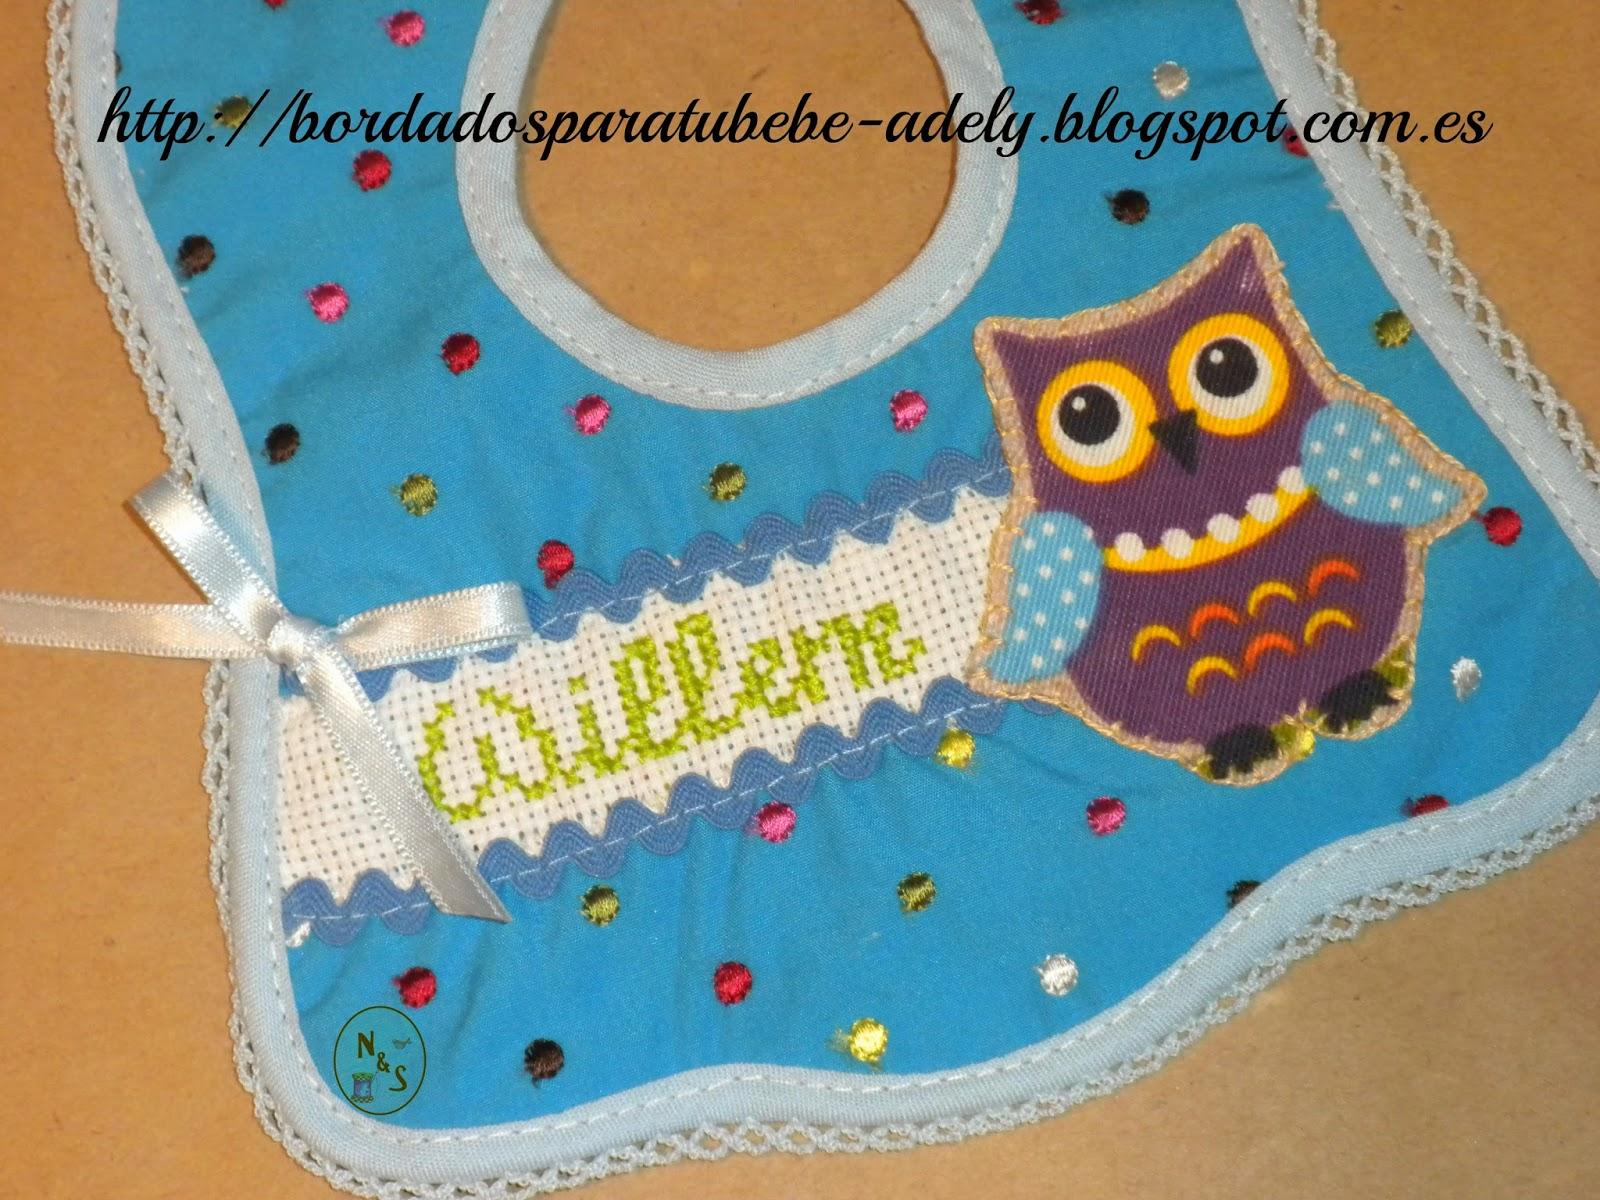 Babero artesanal personalizado para bebé-Regalo original personalizado infantil punto de cruz.